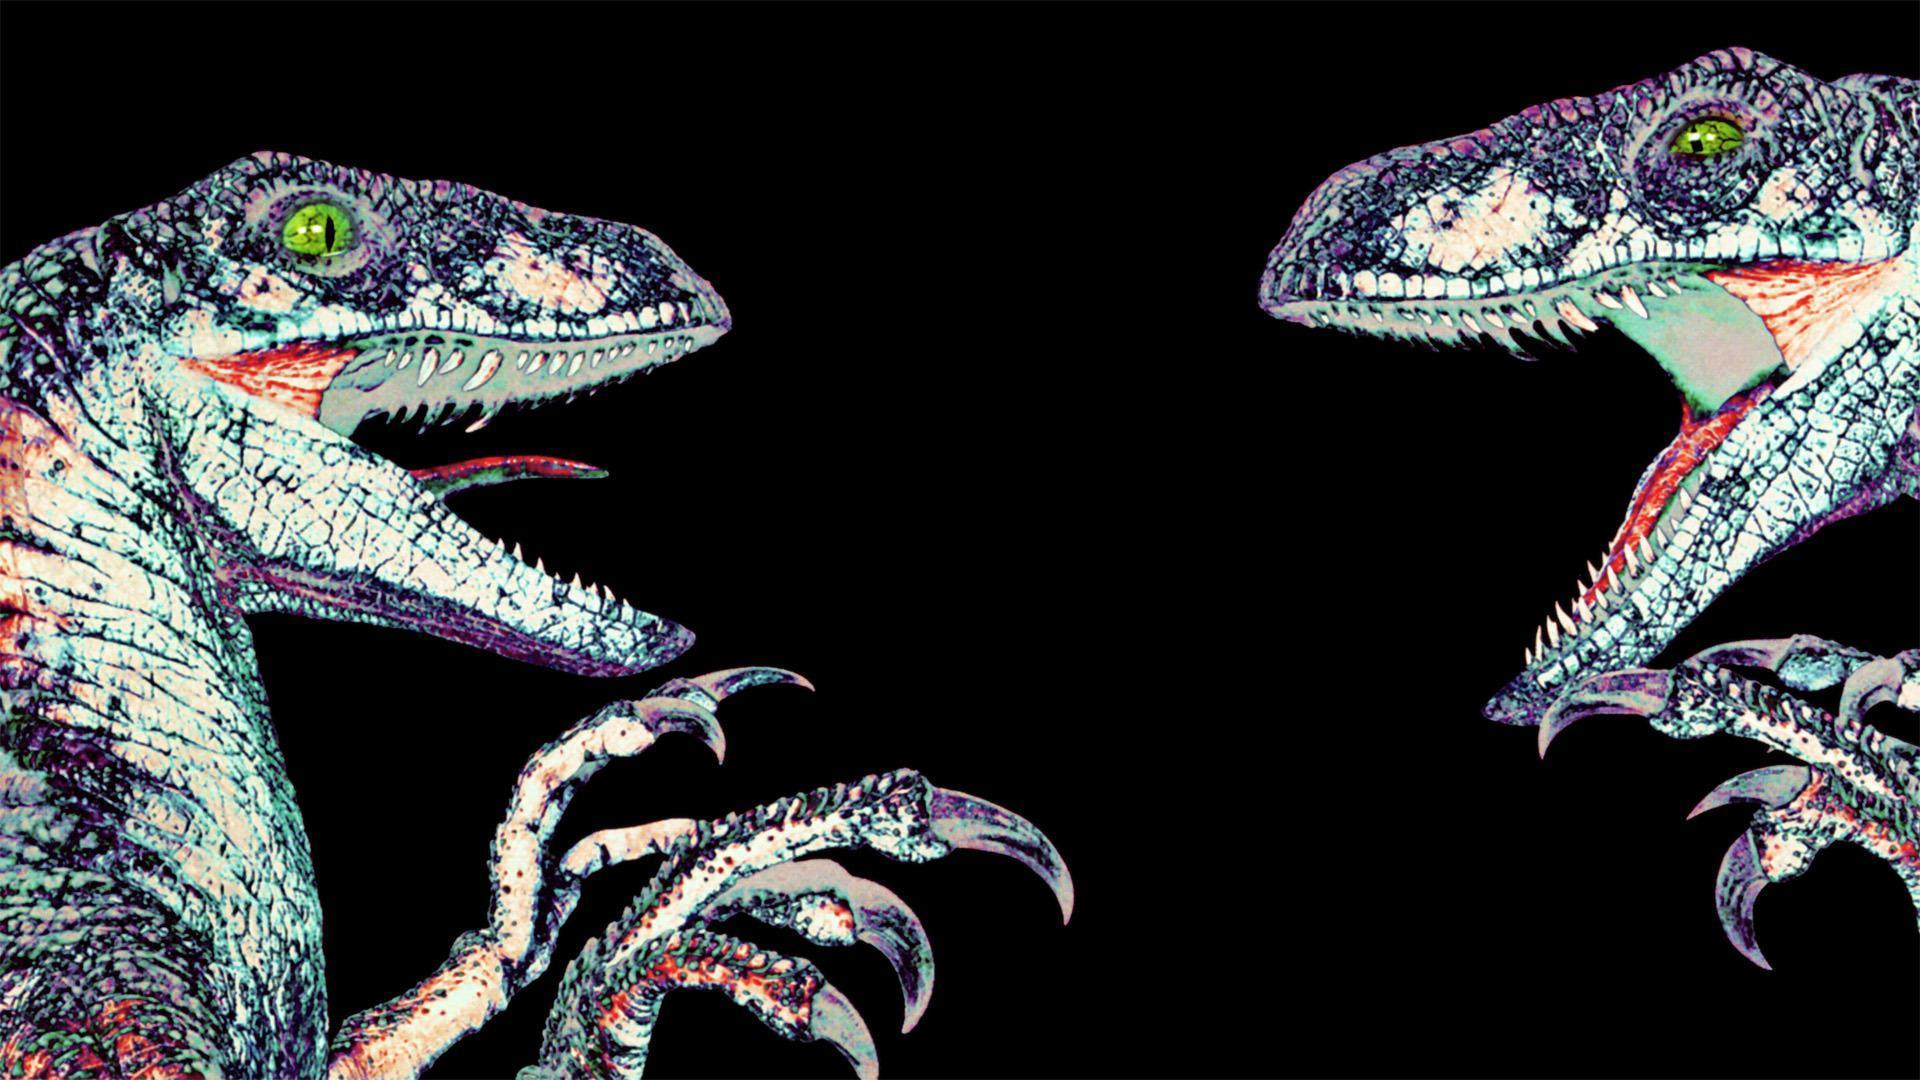 Jurassic Park HD Wallpaper   Background Image   1920x1080   ID:793897 - Wallpaper Abyss